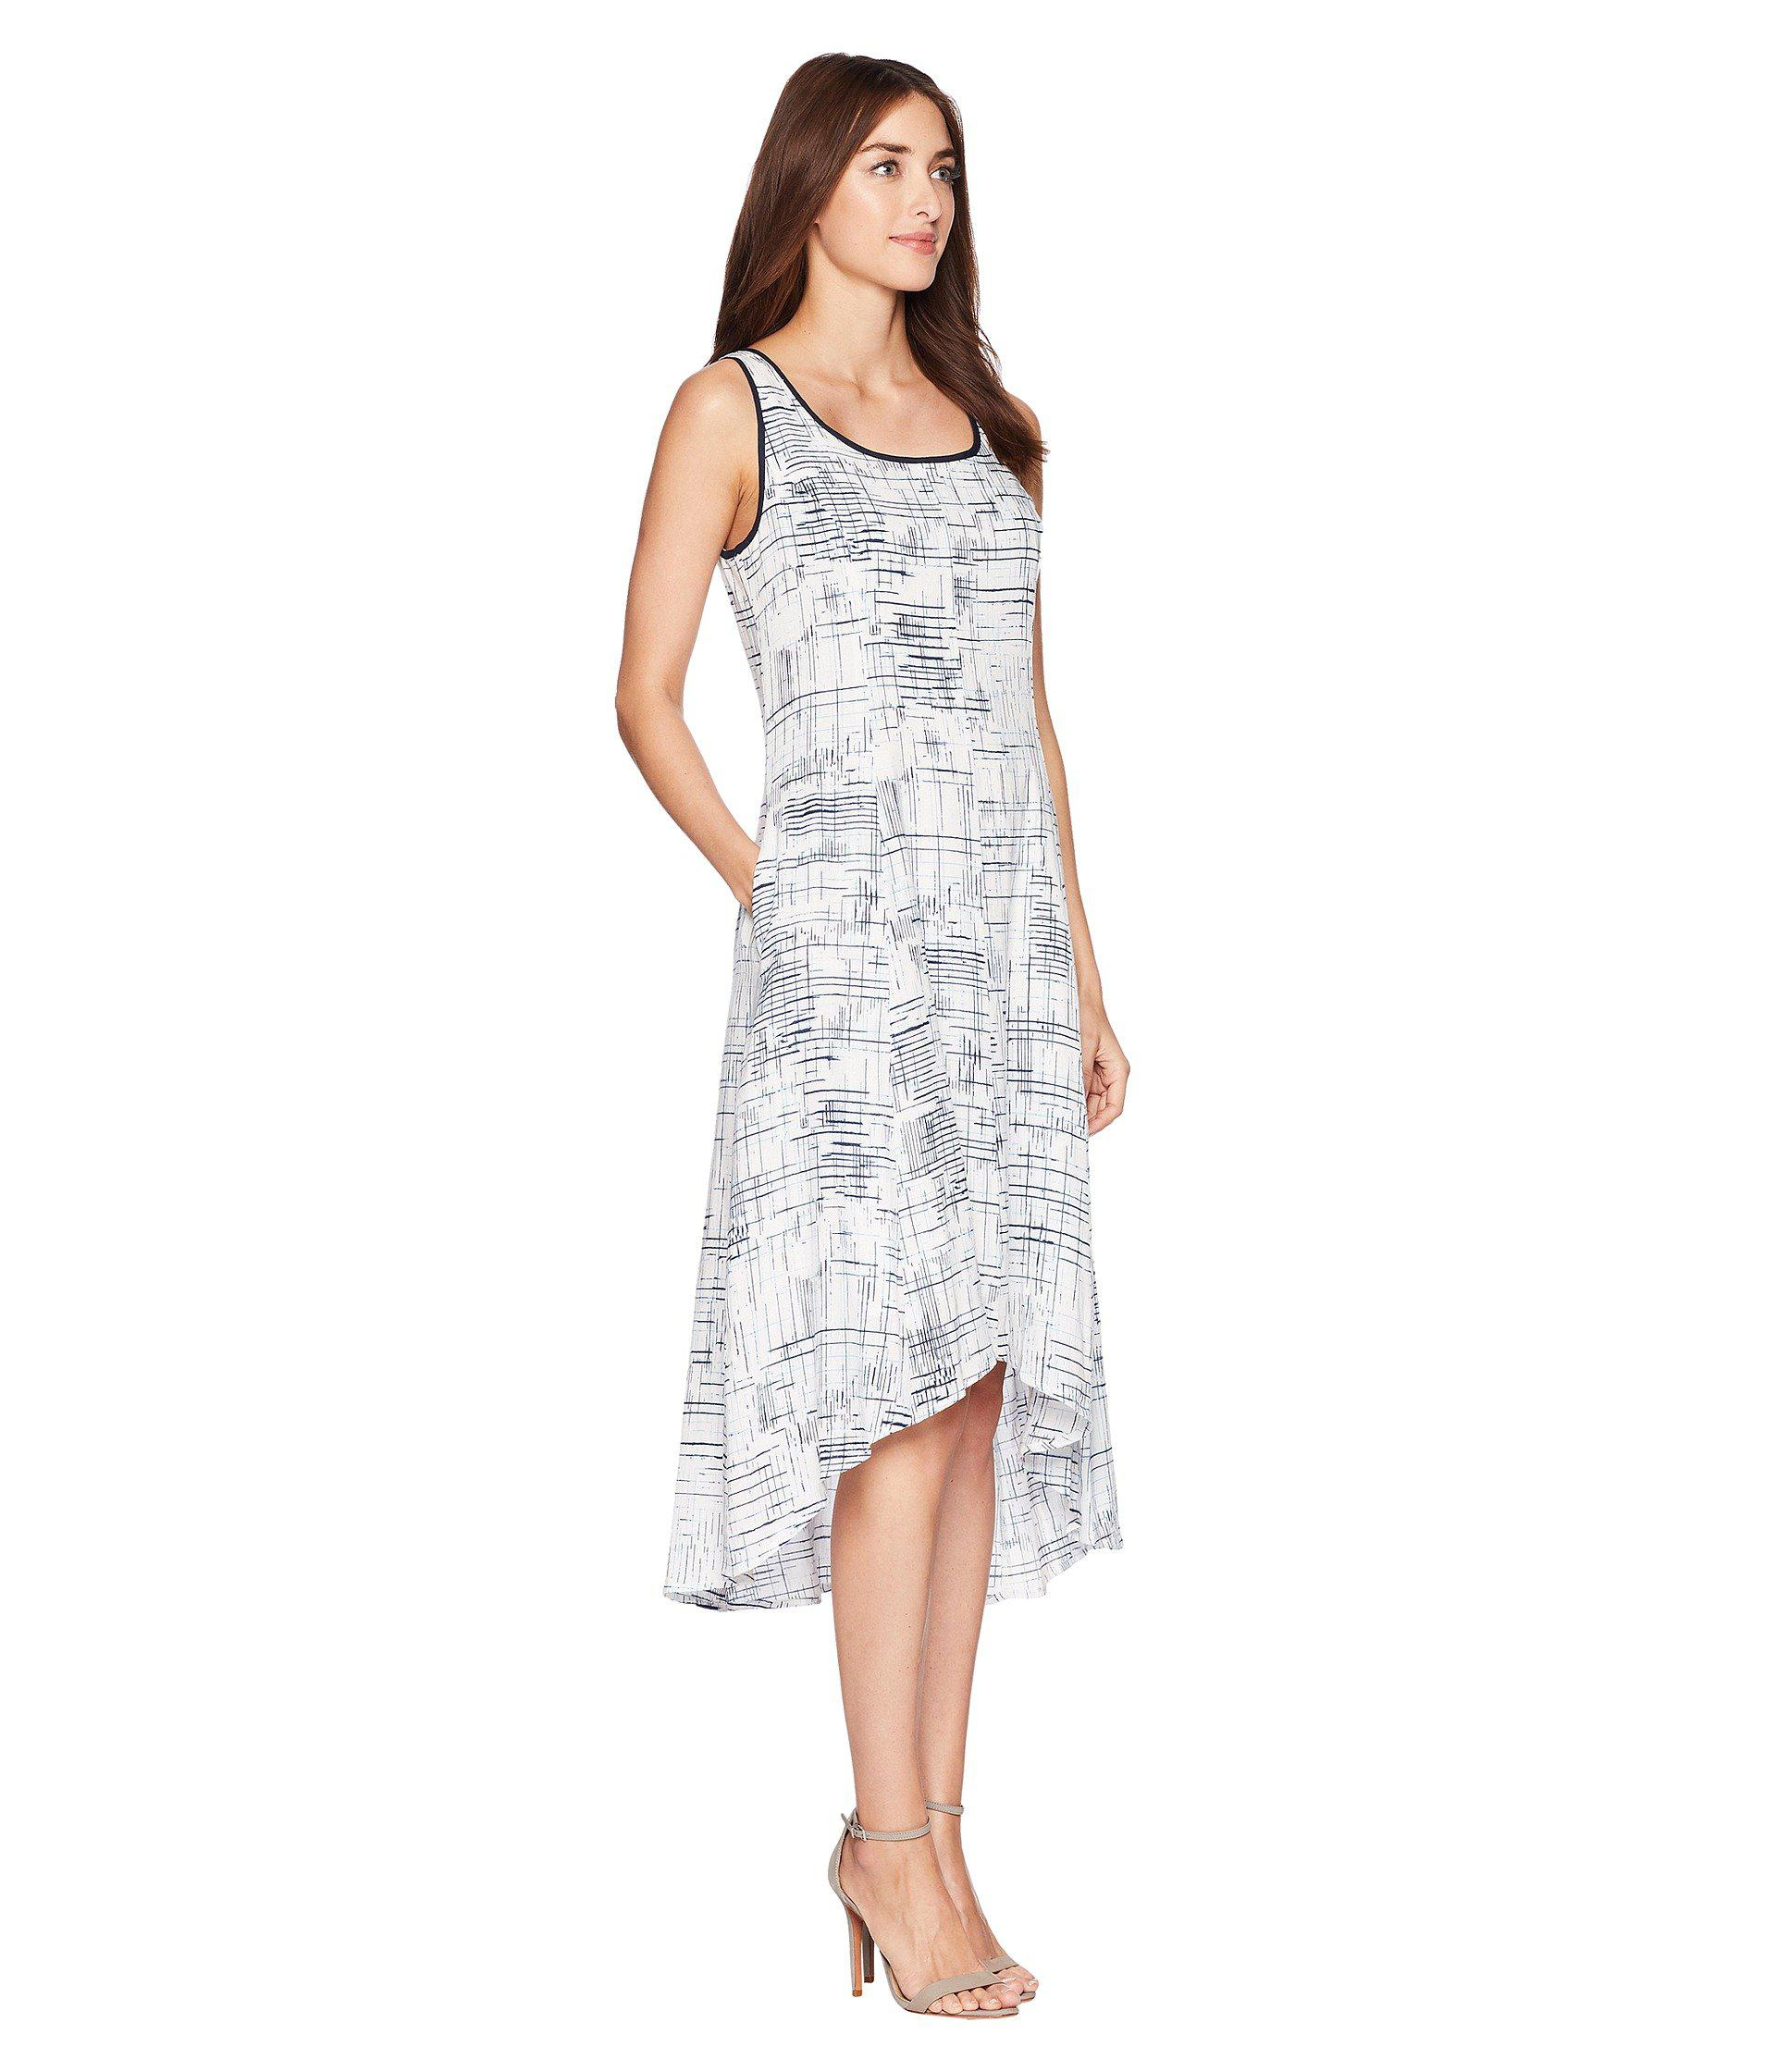 ff7404dbf8c Jones New York - White Sleeveless Printed Linen High-low Hem Dress - Lyst.  View fullscreen